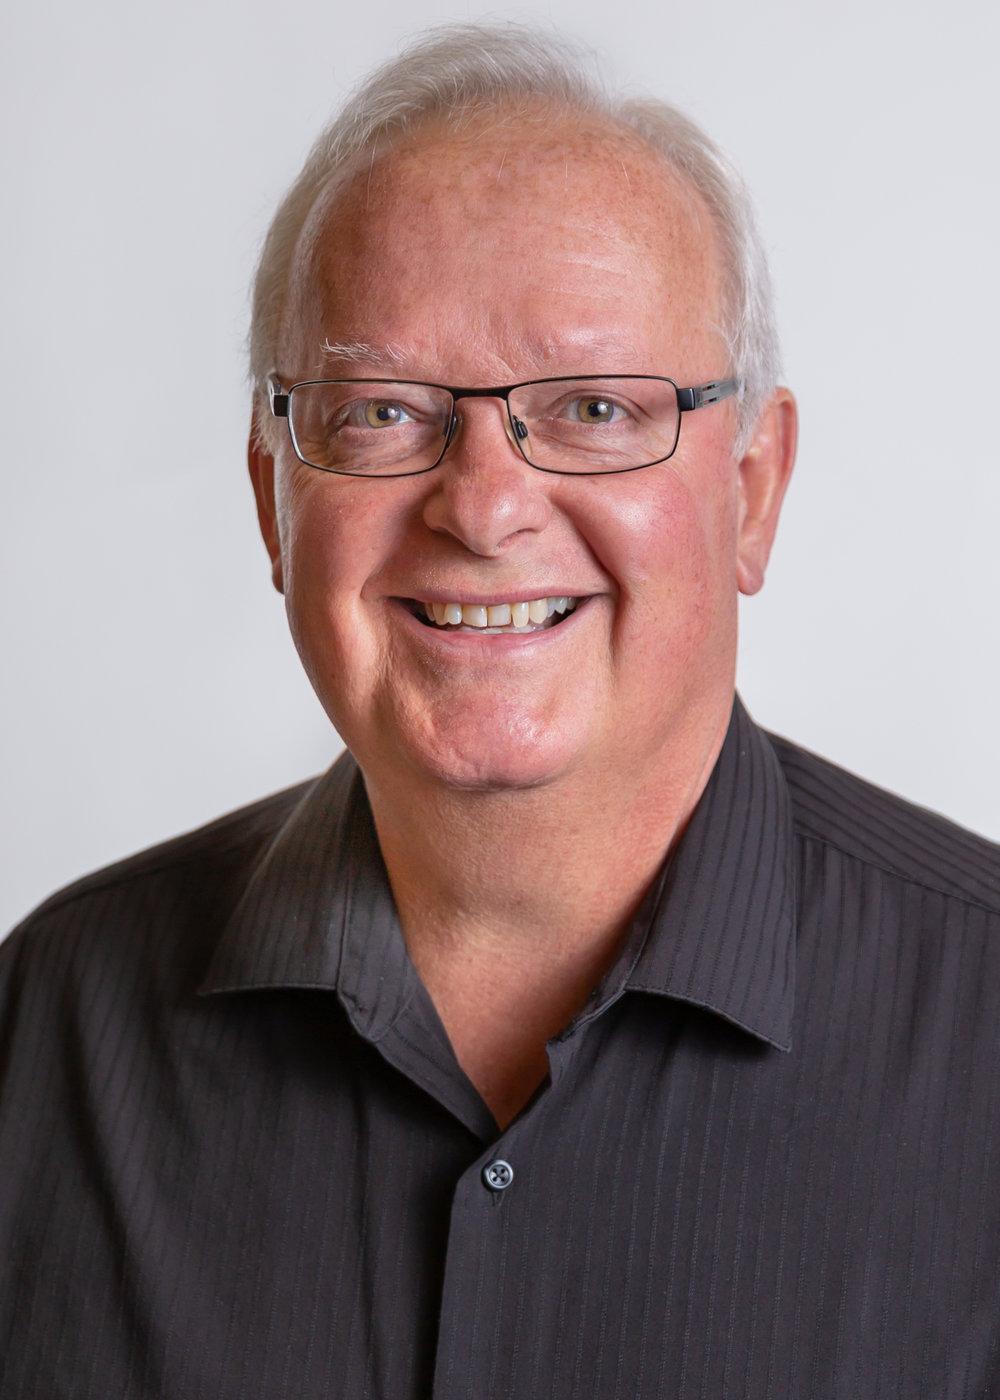 Dwight Gascho | Carnac On staff since 2016